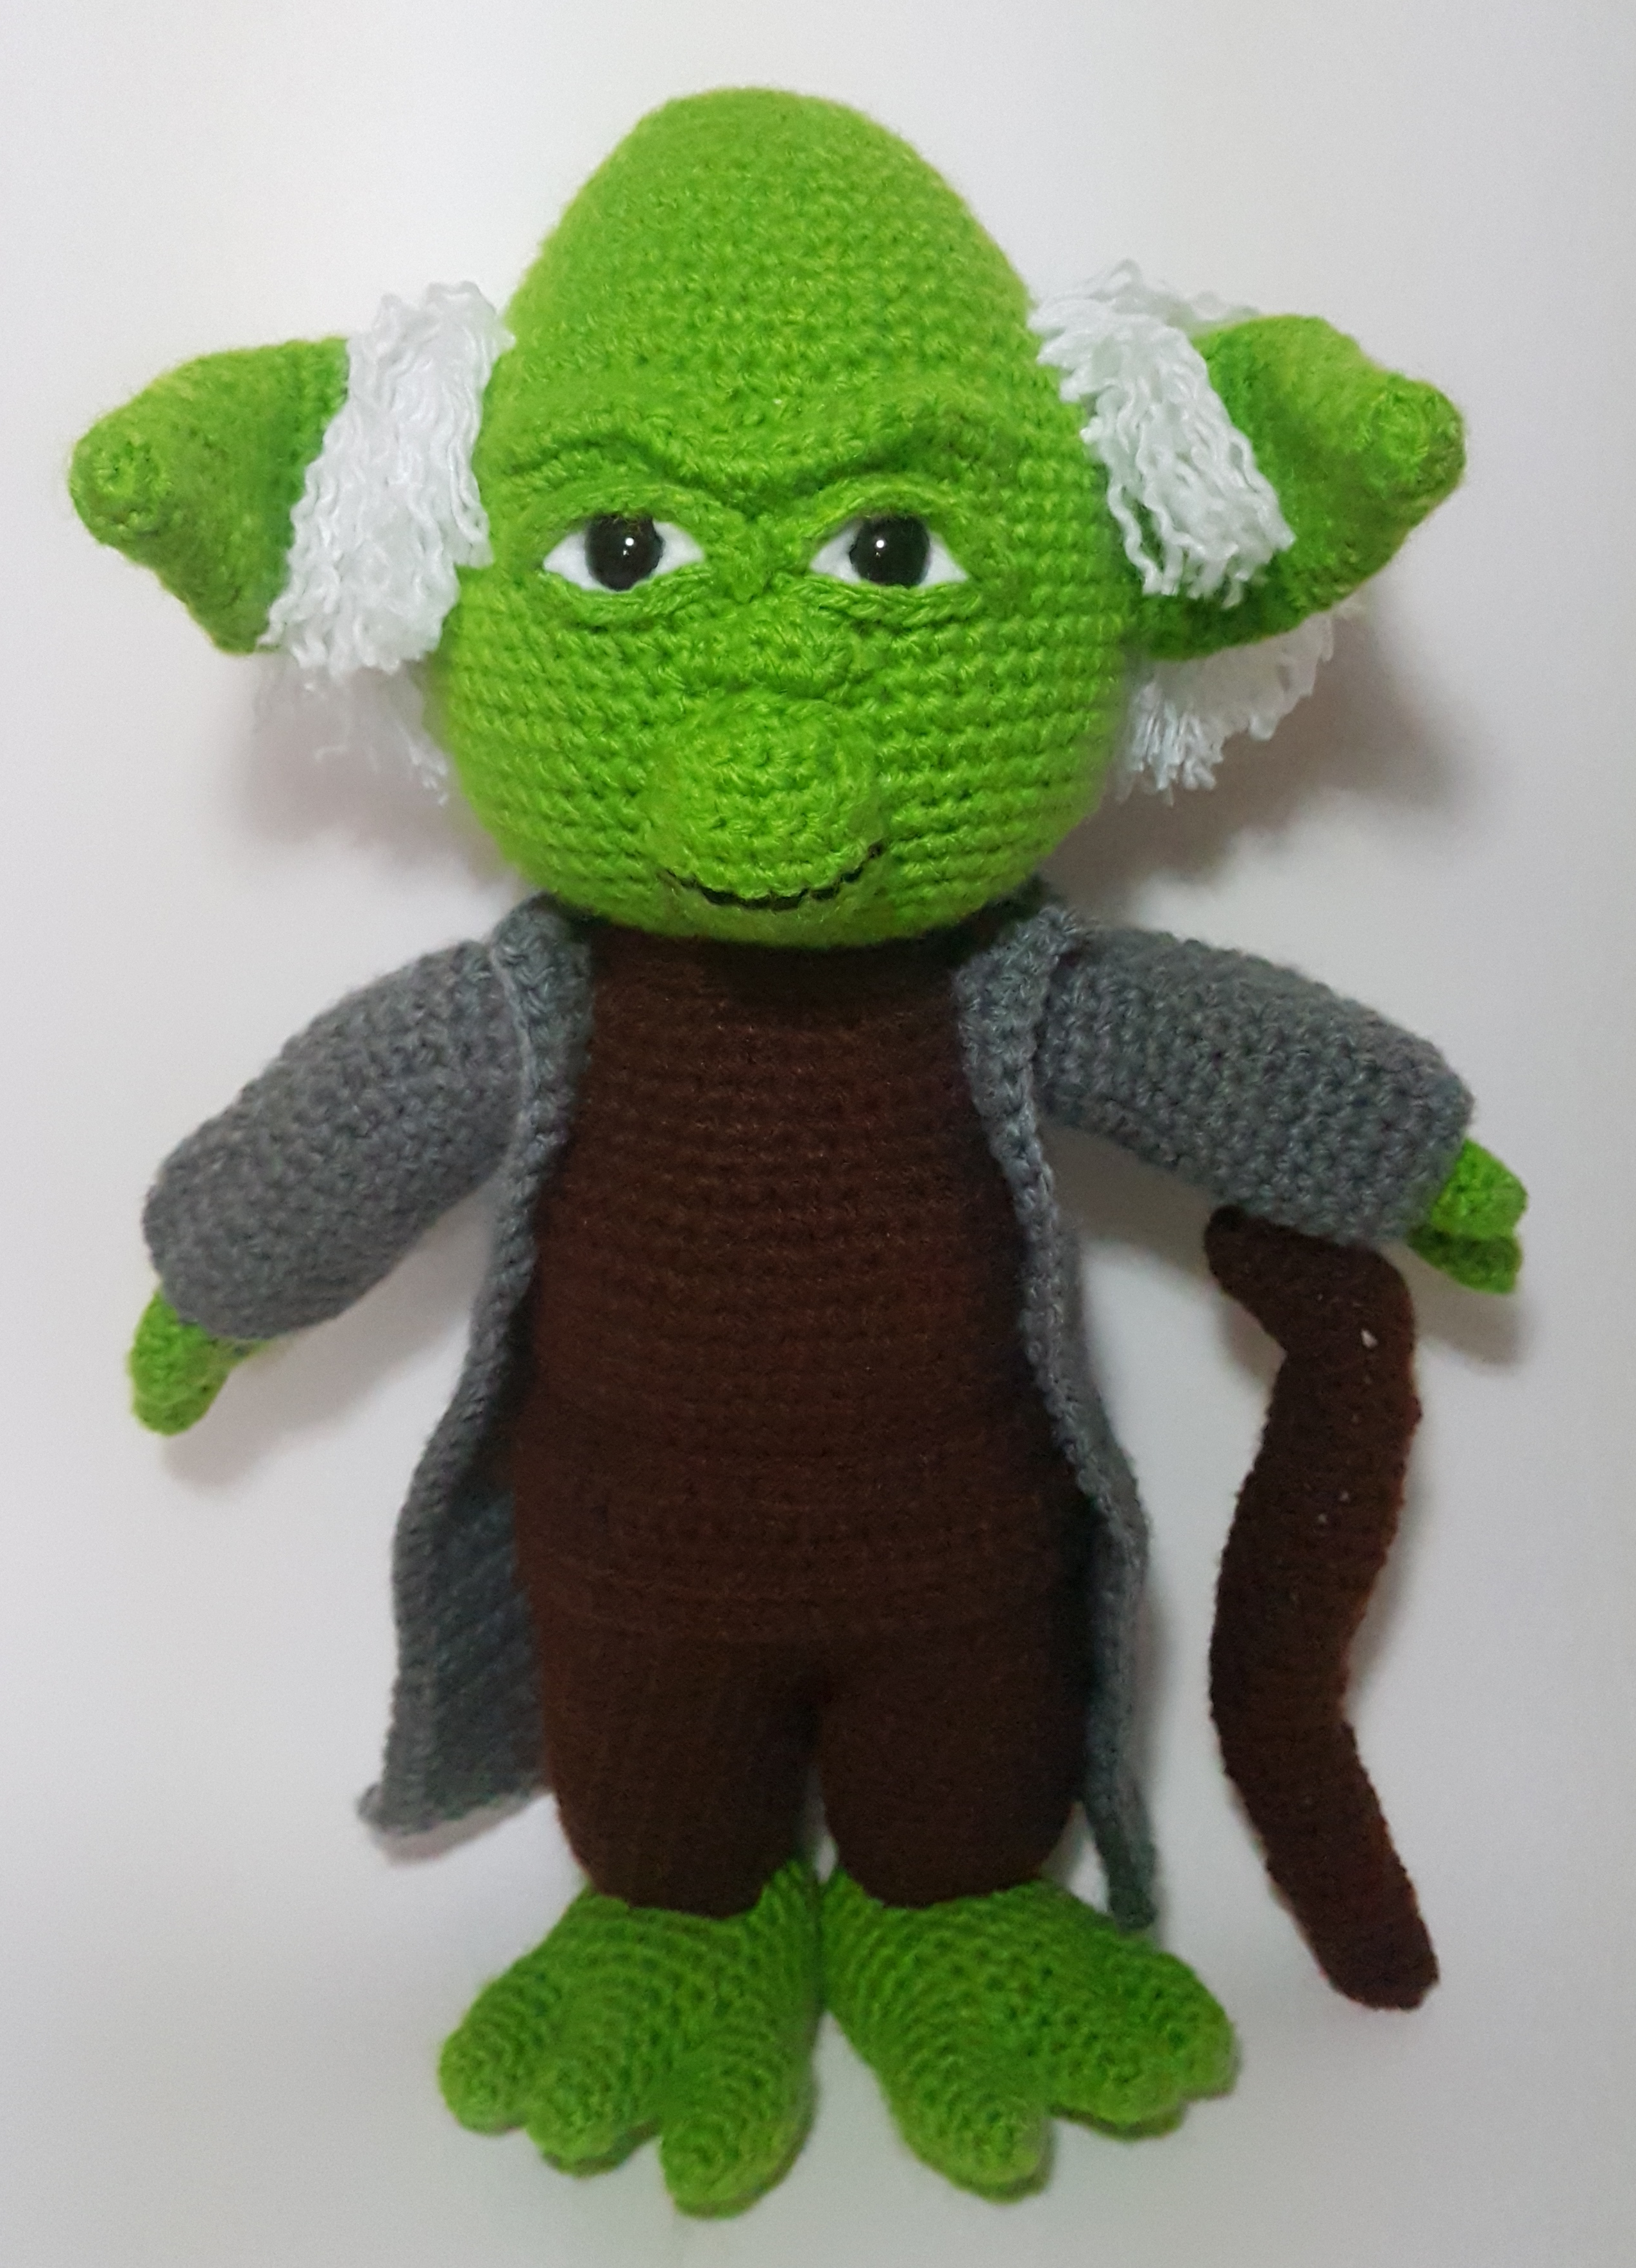 Amigurumi Mestre Yoda - Star Wars - R$ 80,00 em Mercado Livre   3536x2550